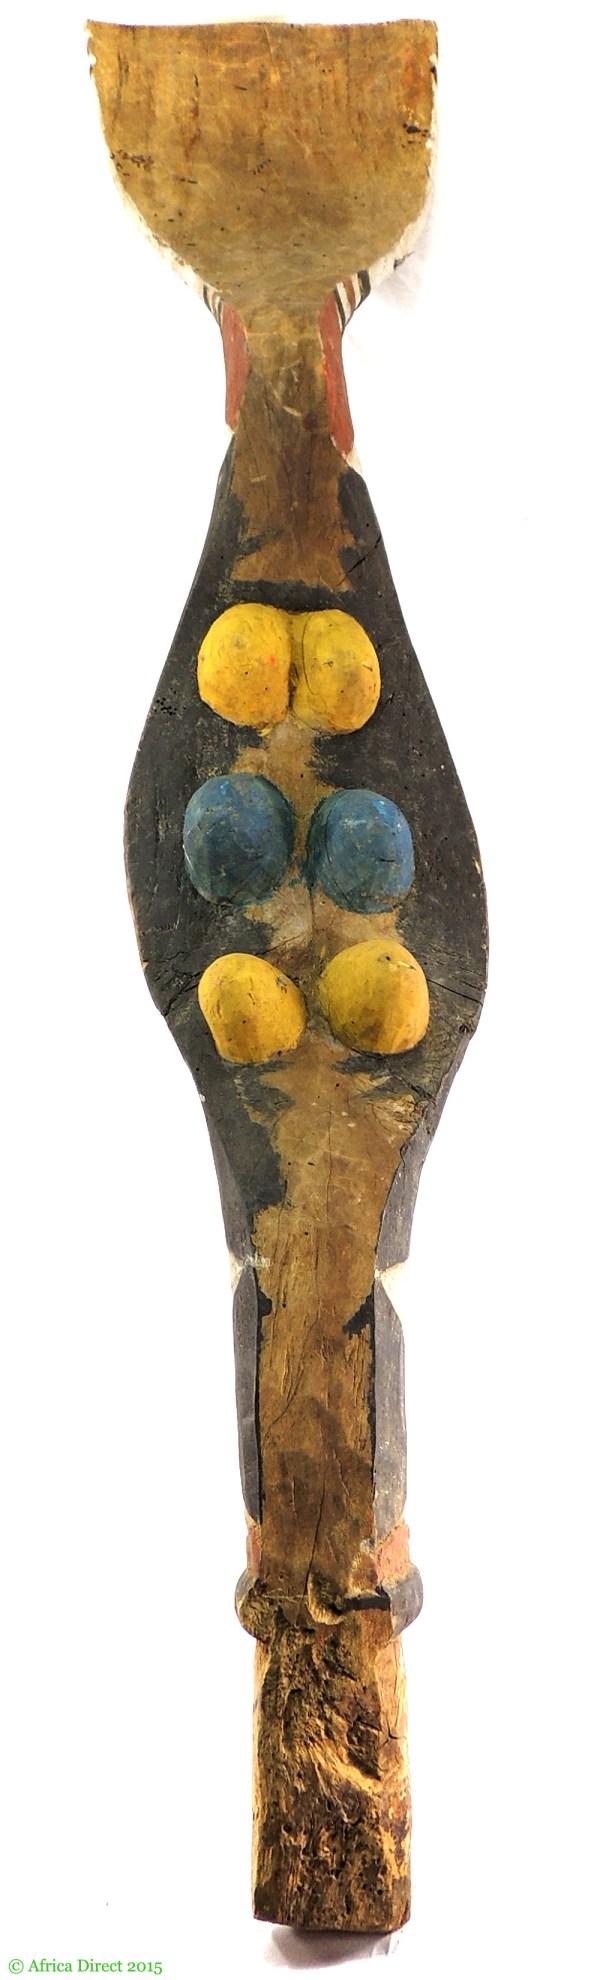 Baga Snake Bansonyi Sculpture Guinea African Art 65 - Masks